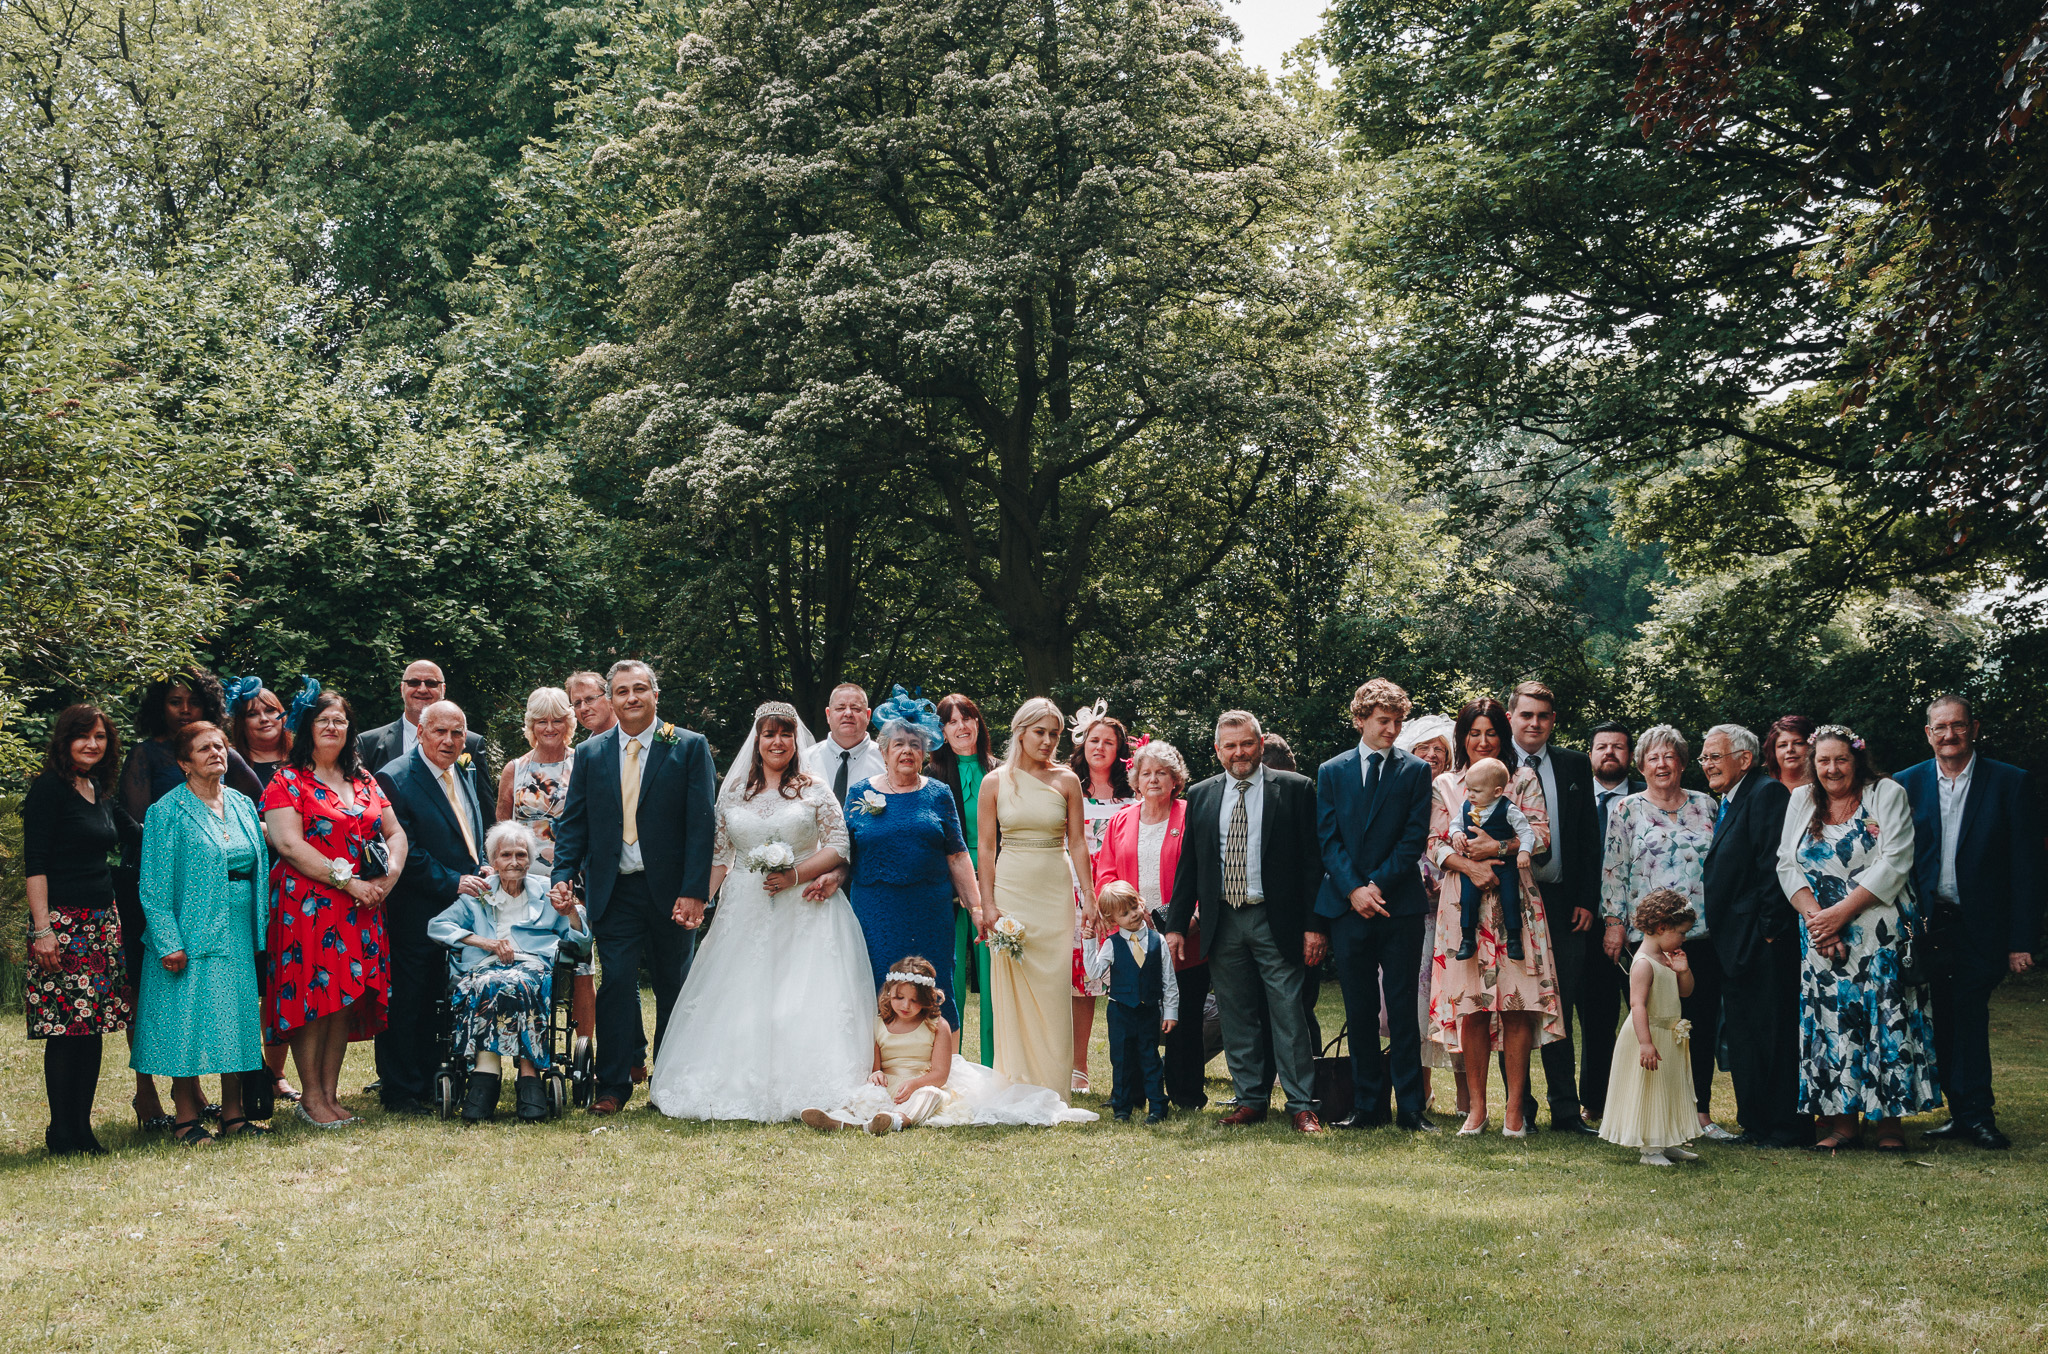 Nat and Sergio Wedding Photos - Website Quality_127.jpg